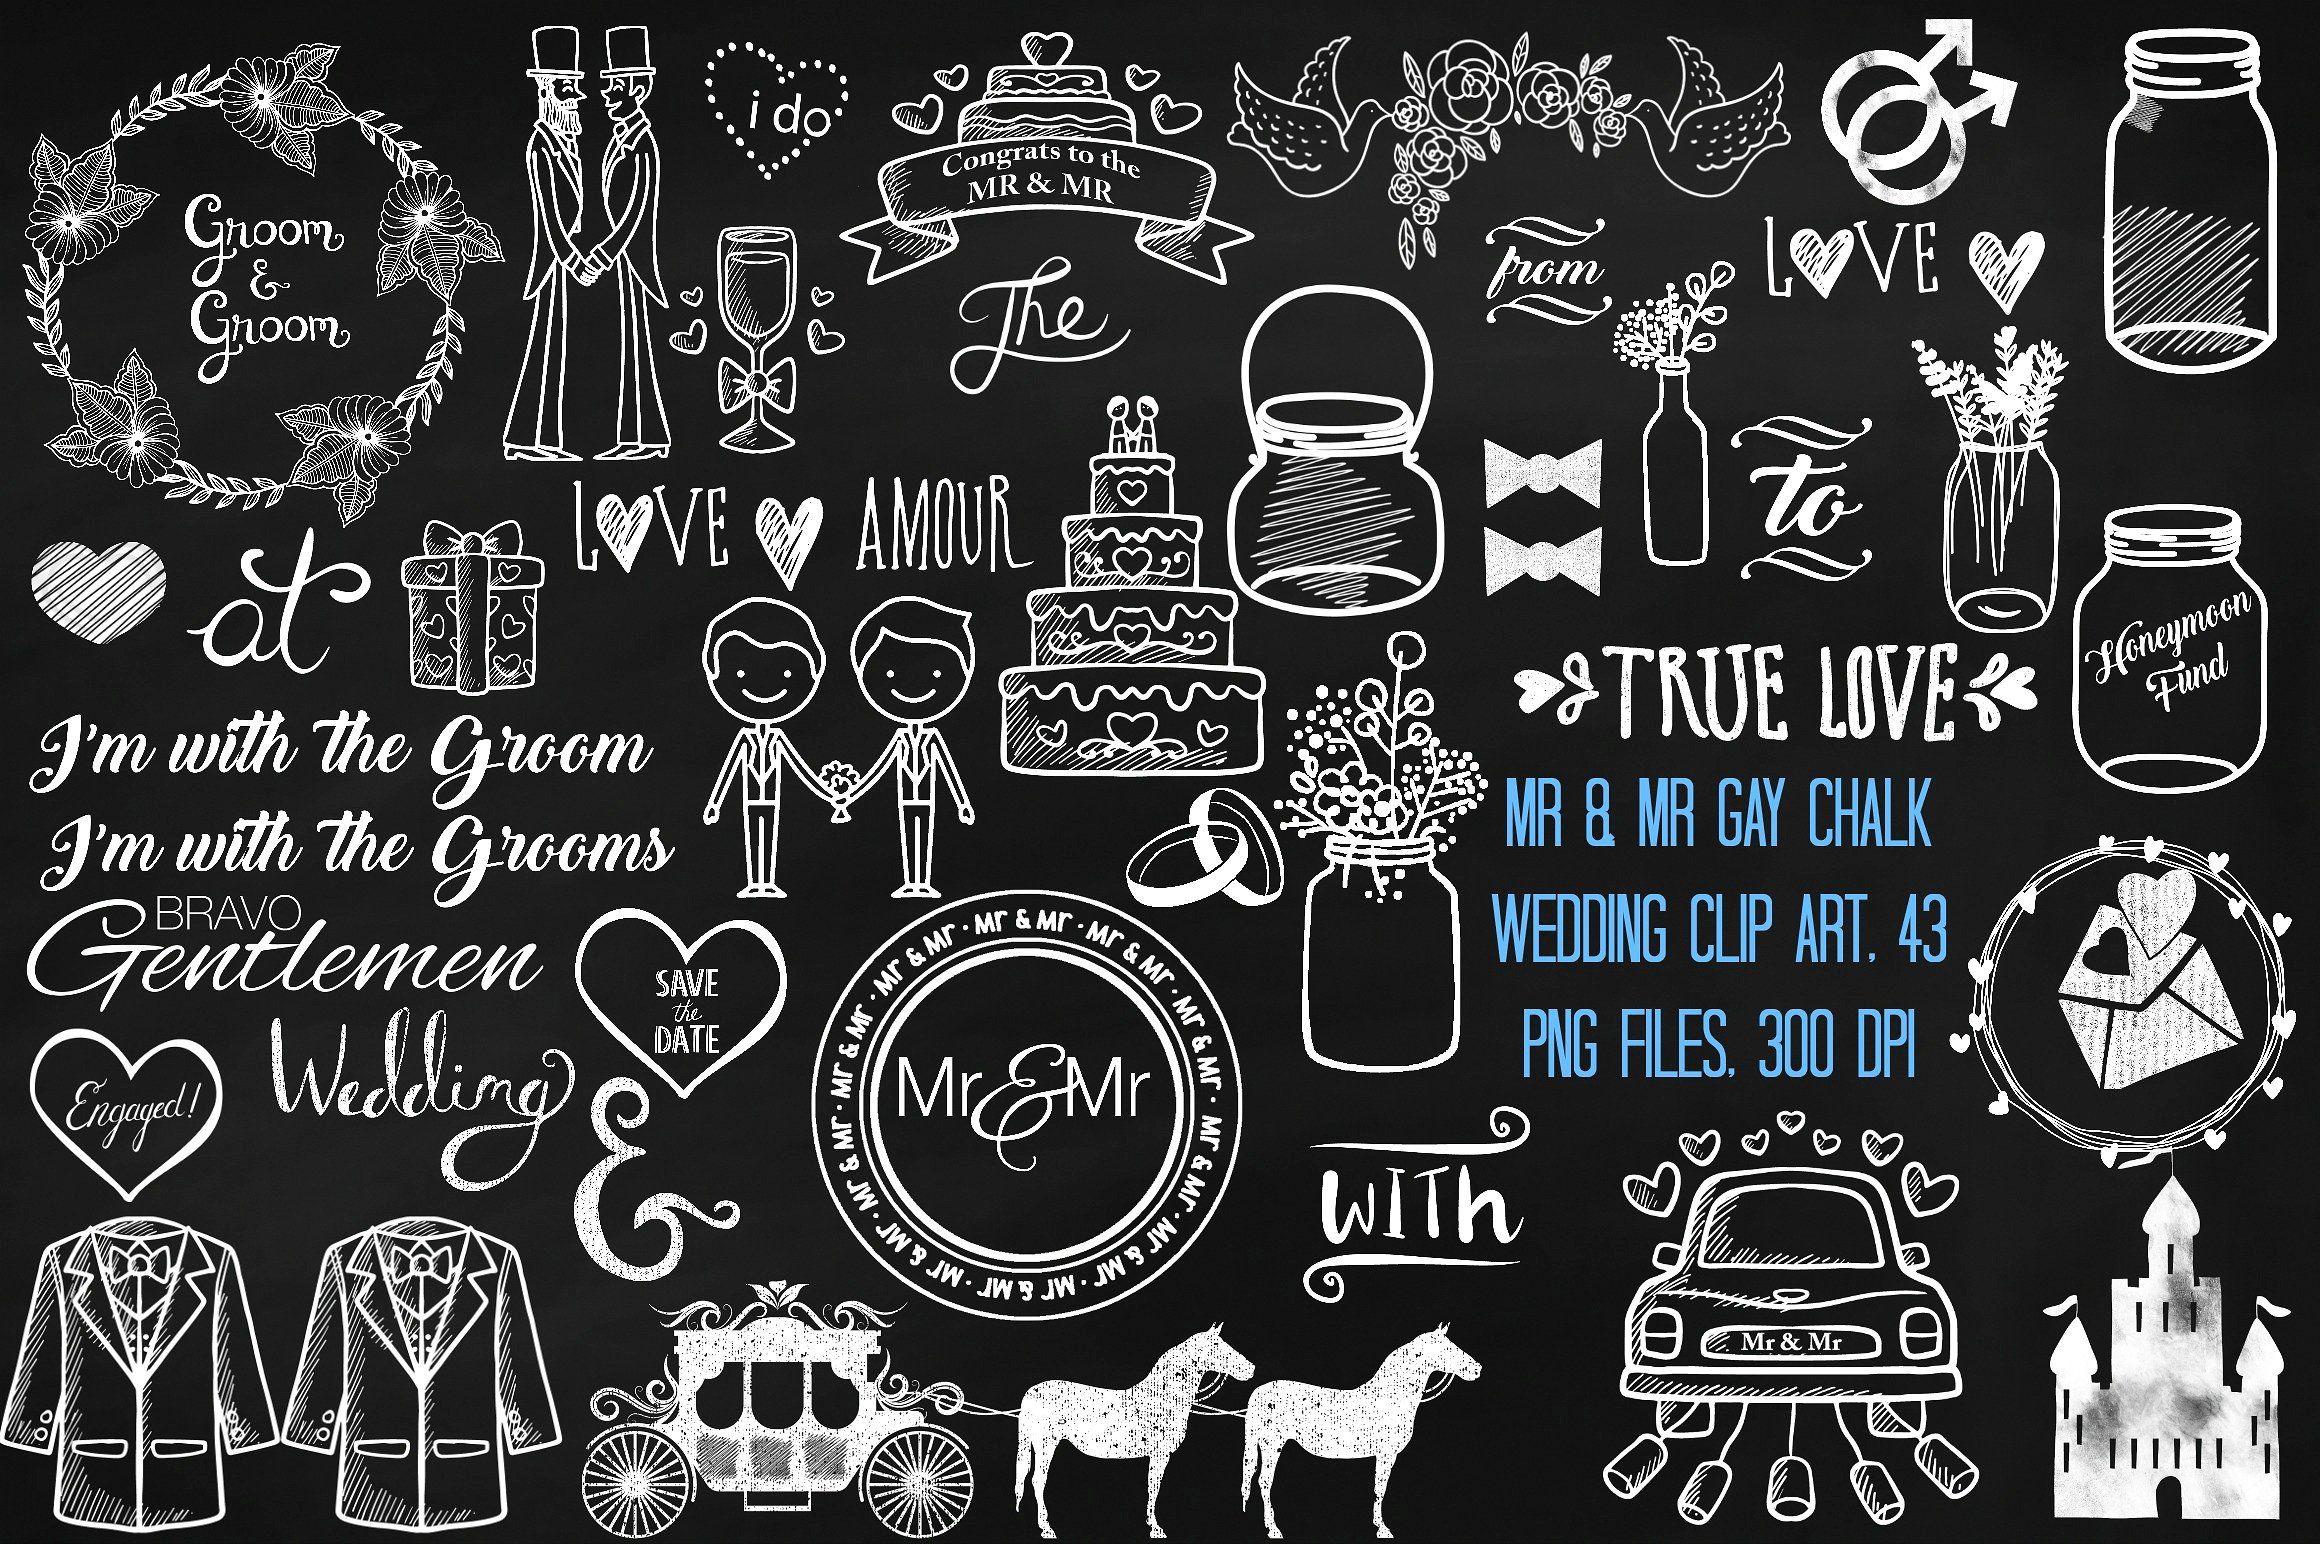 hight resolution of mr mr gay chalk wedding clip art by frankiesdaughtersdesign on creativemarket pizarra edredones